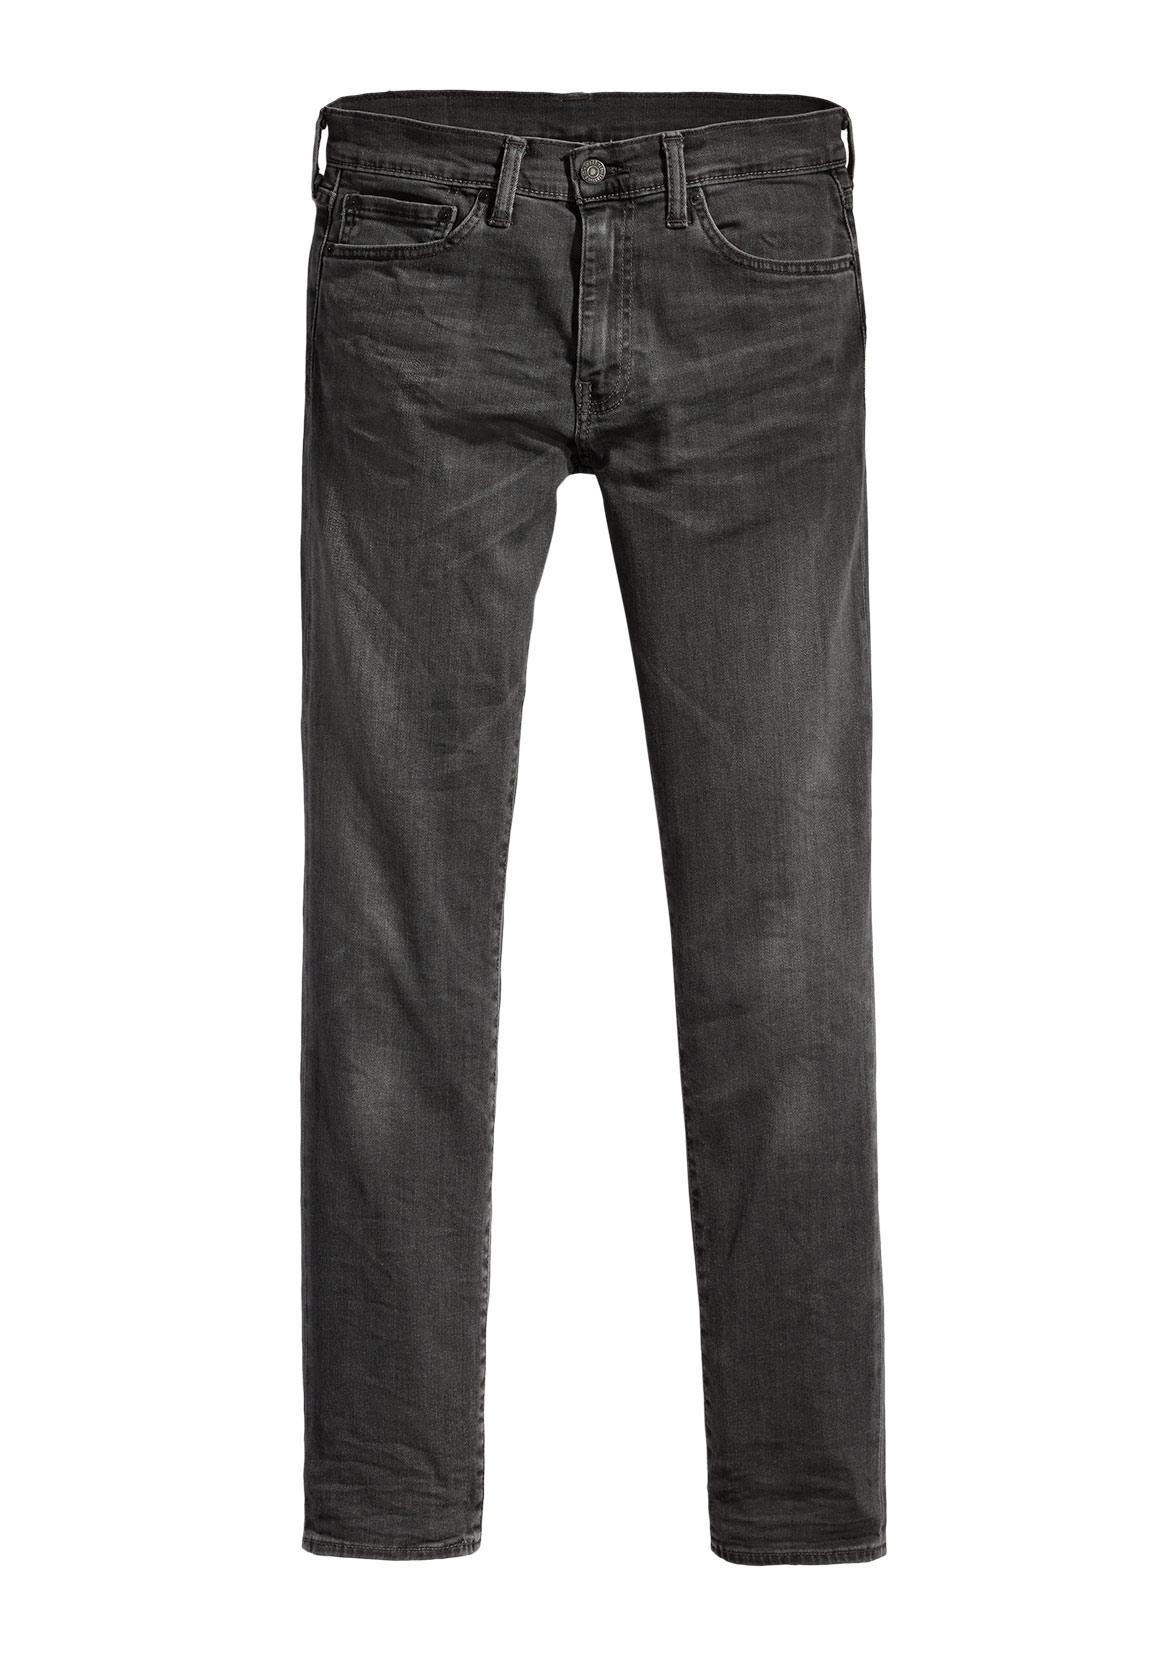 levi s herren jeans 511 slim fit 04511 2091 grau herren. Black Bedroom Furniture Sets. Home Design Ideas